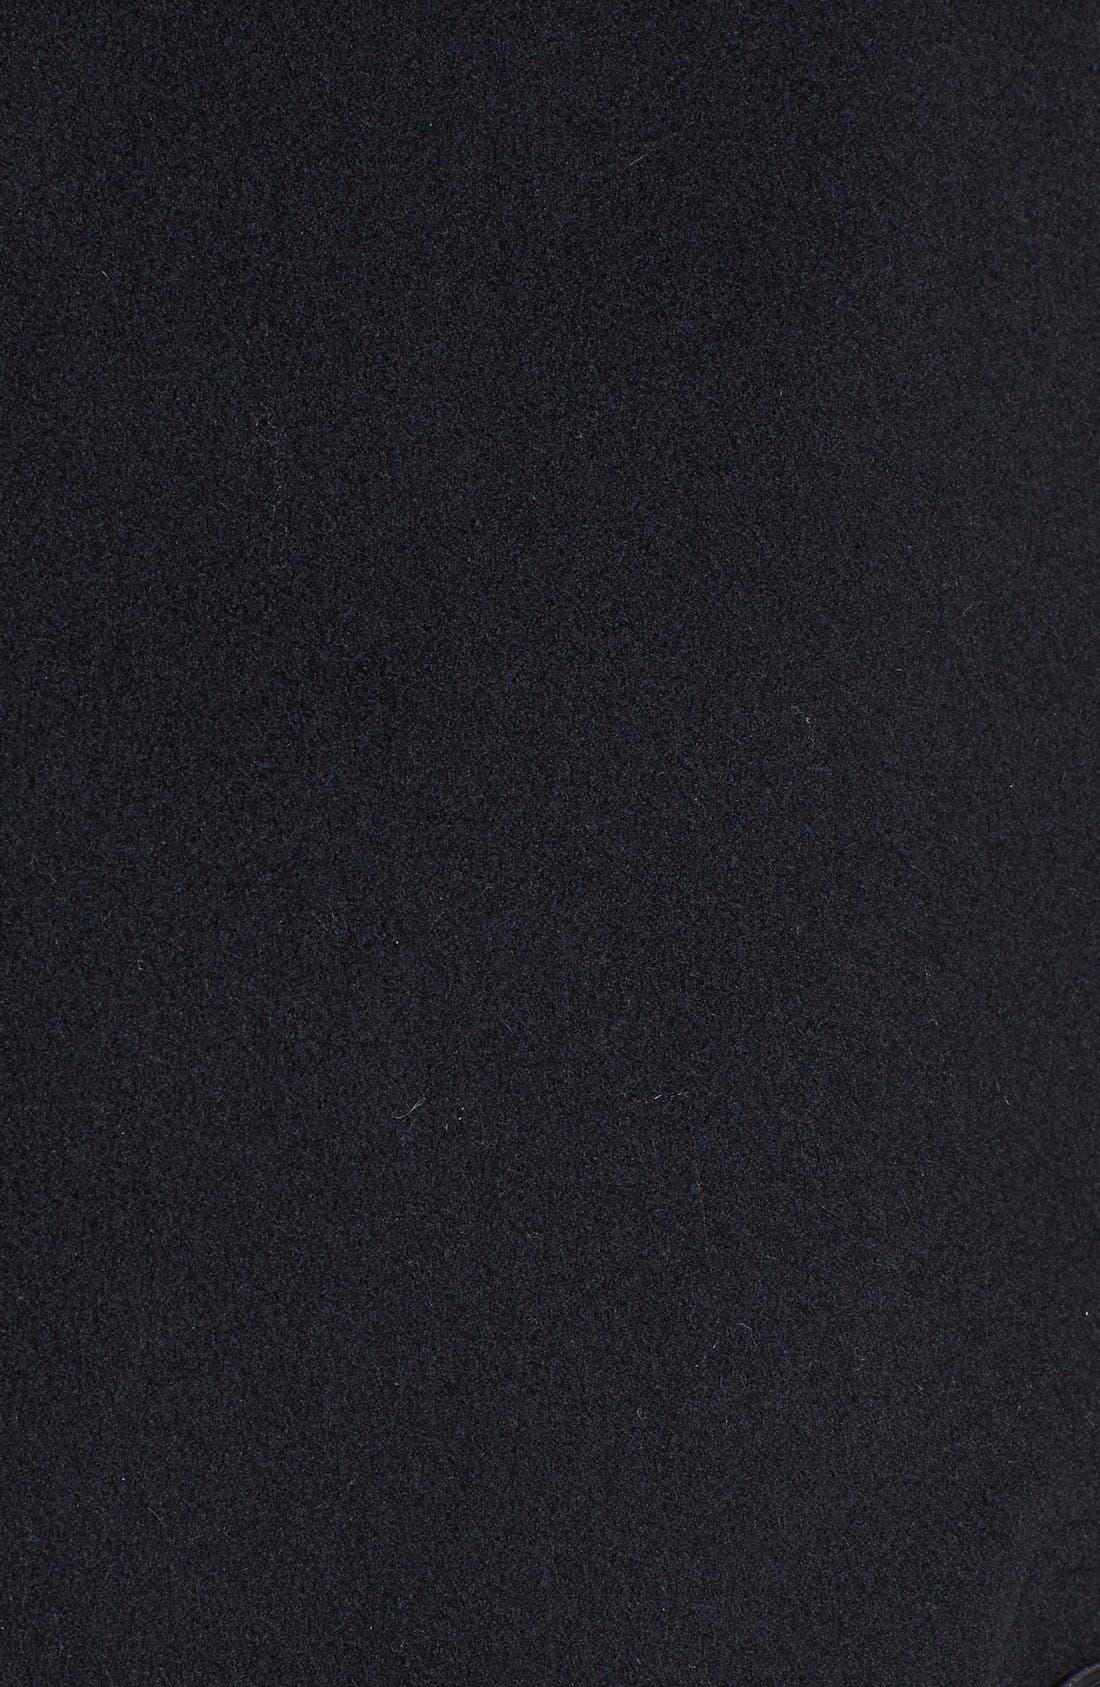 Wool Blend Cape,                             Alternate thumbnail 3, color,                             001